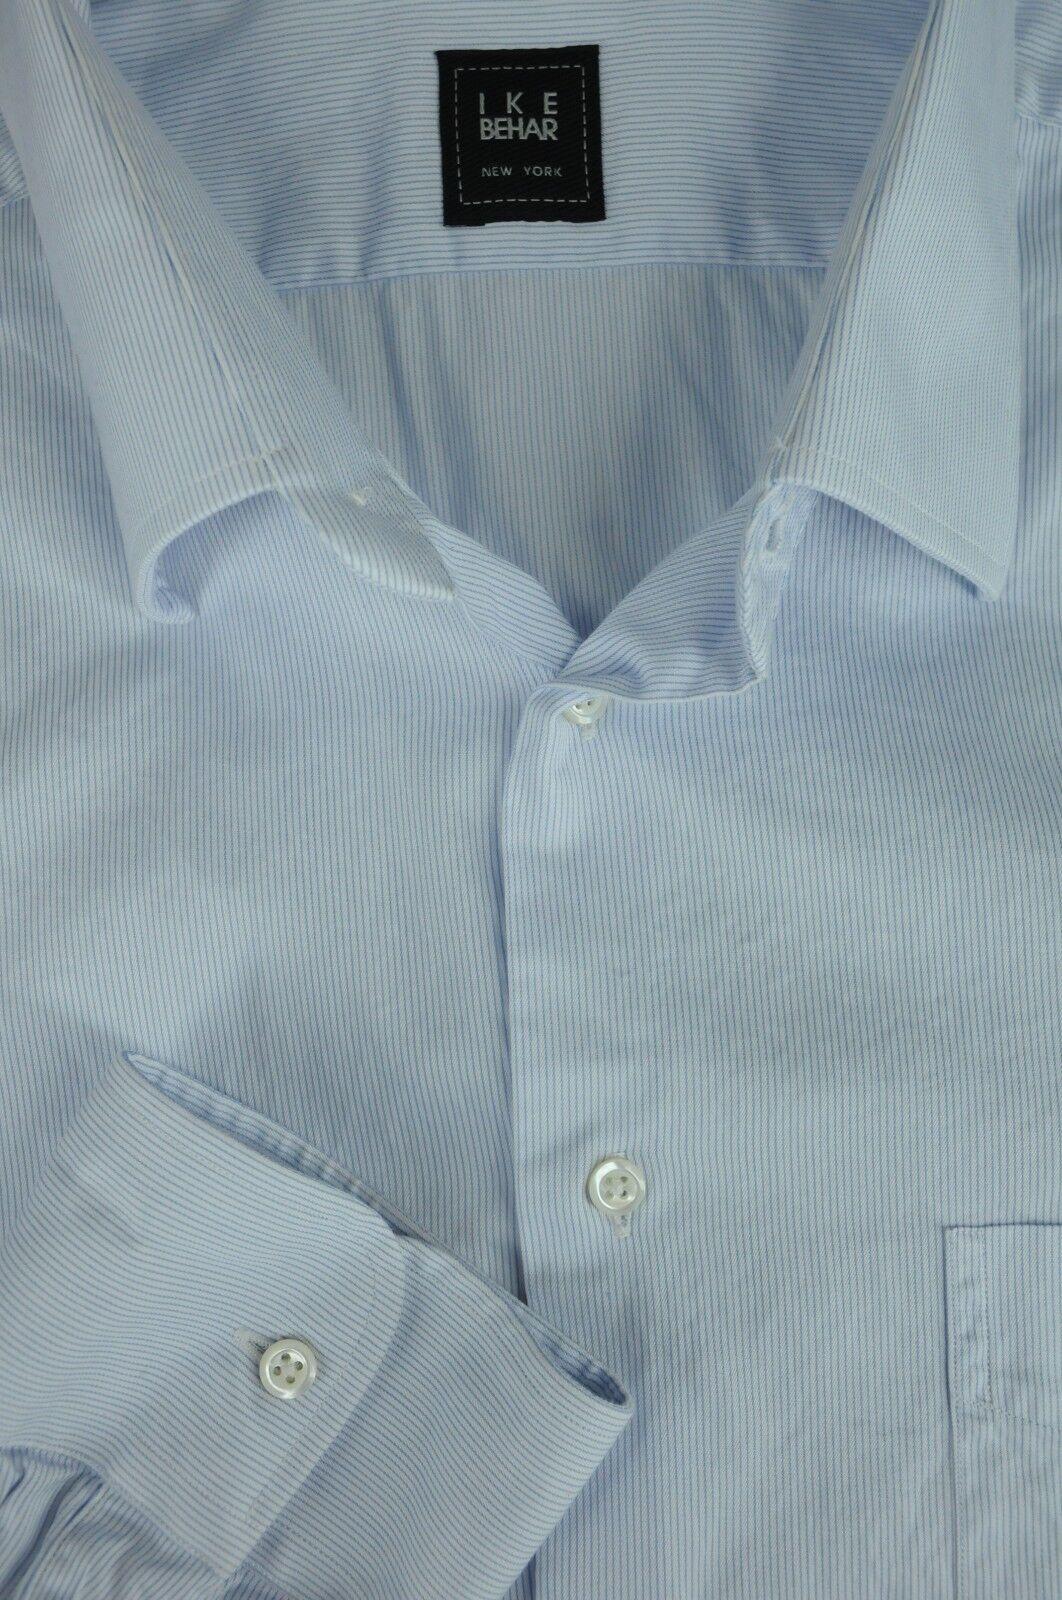 Ike Behar Men's Powder bluee & White Fine Striped Casual Shirt L Large